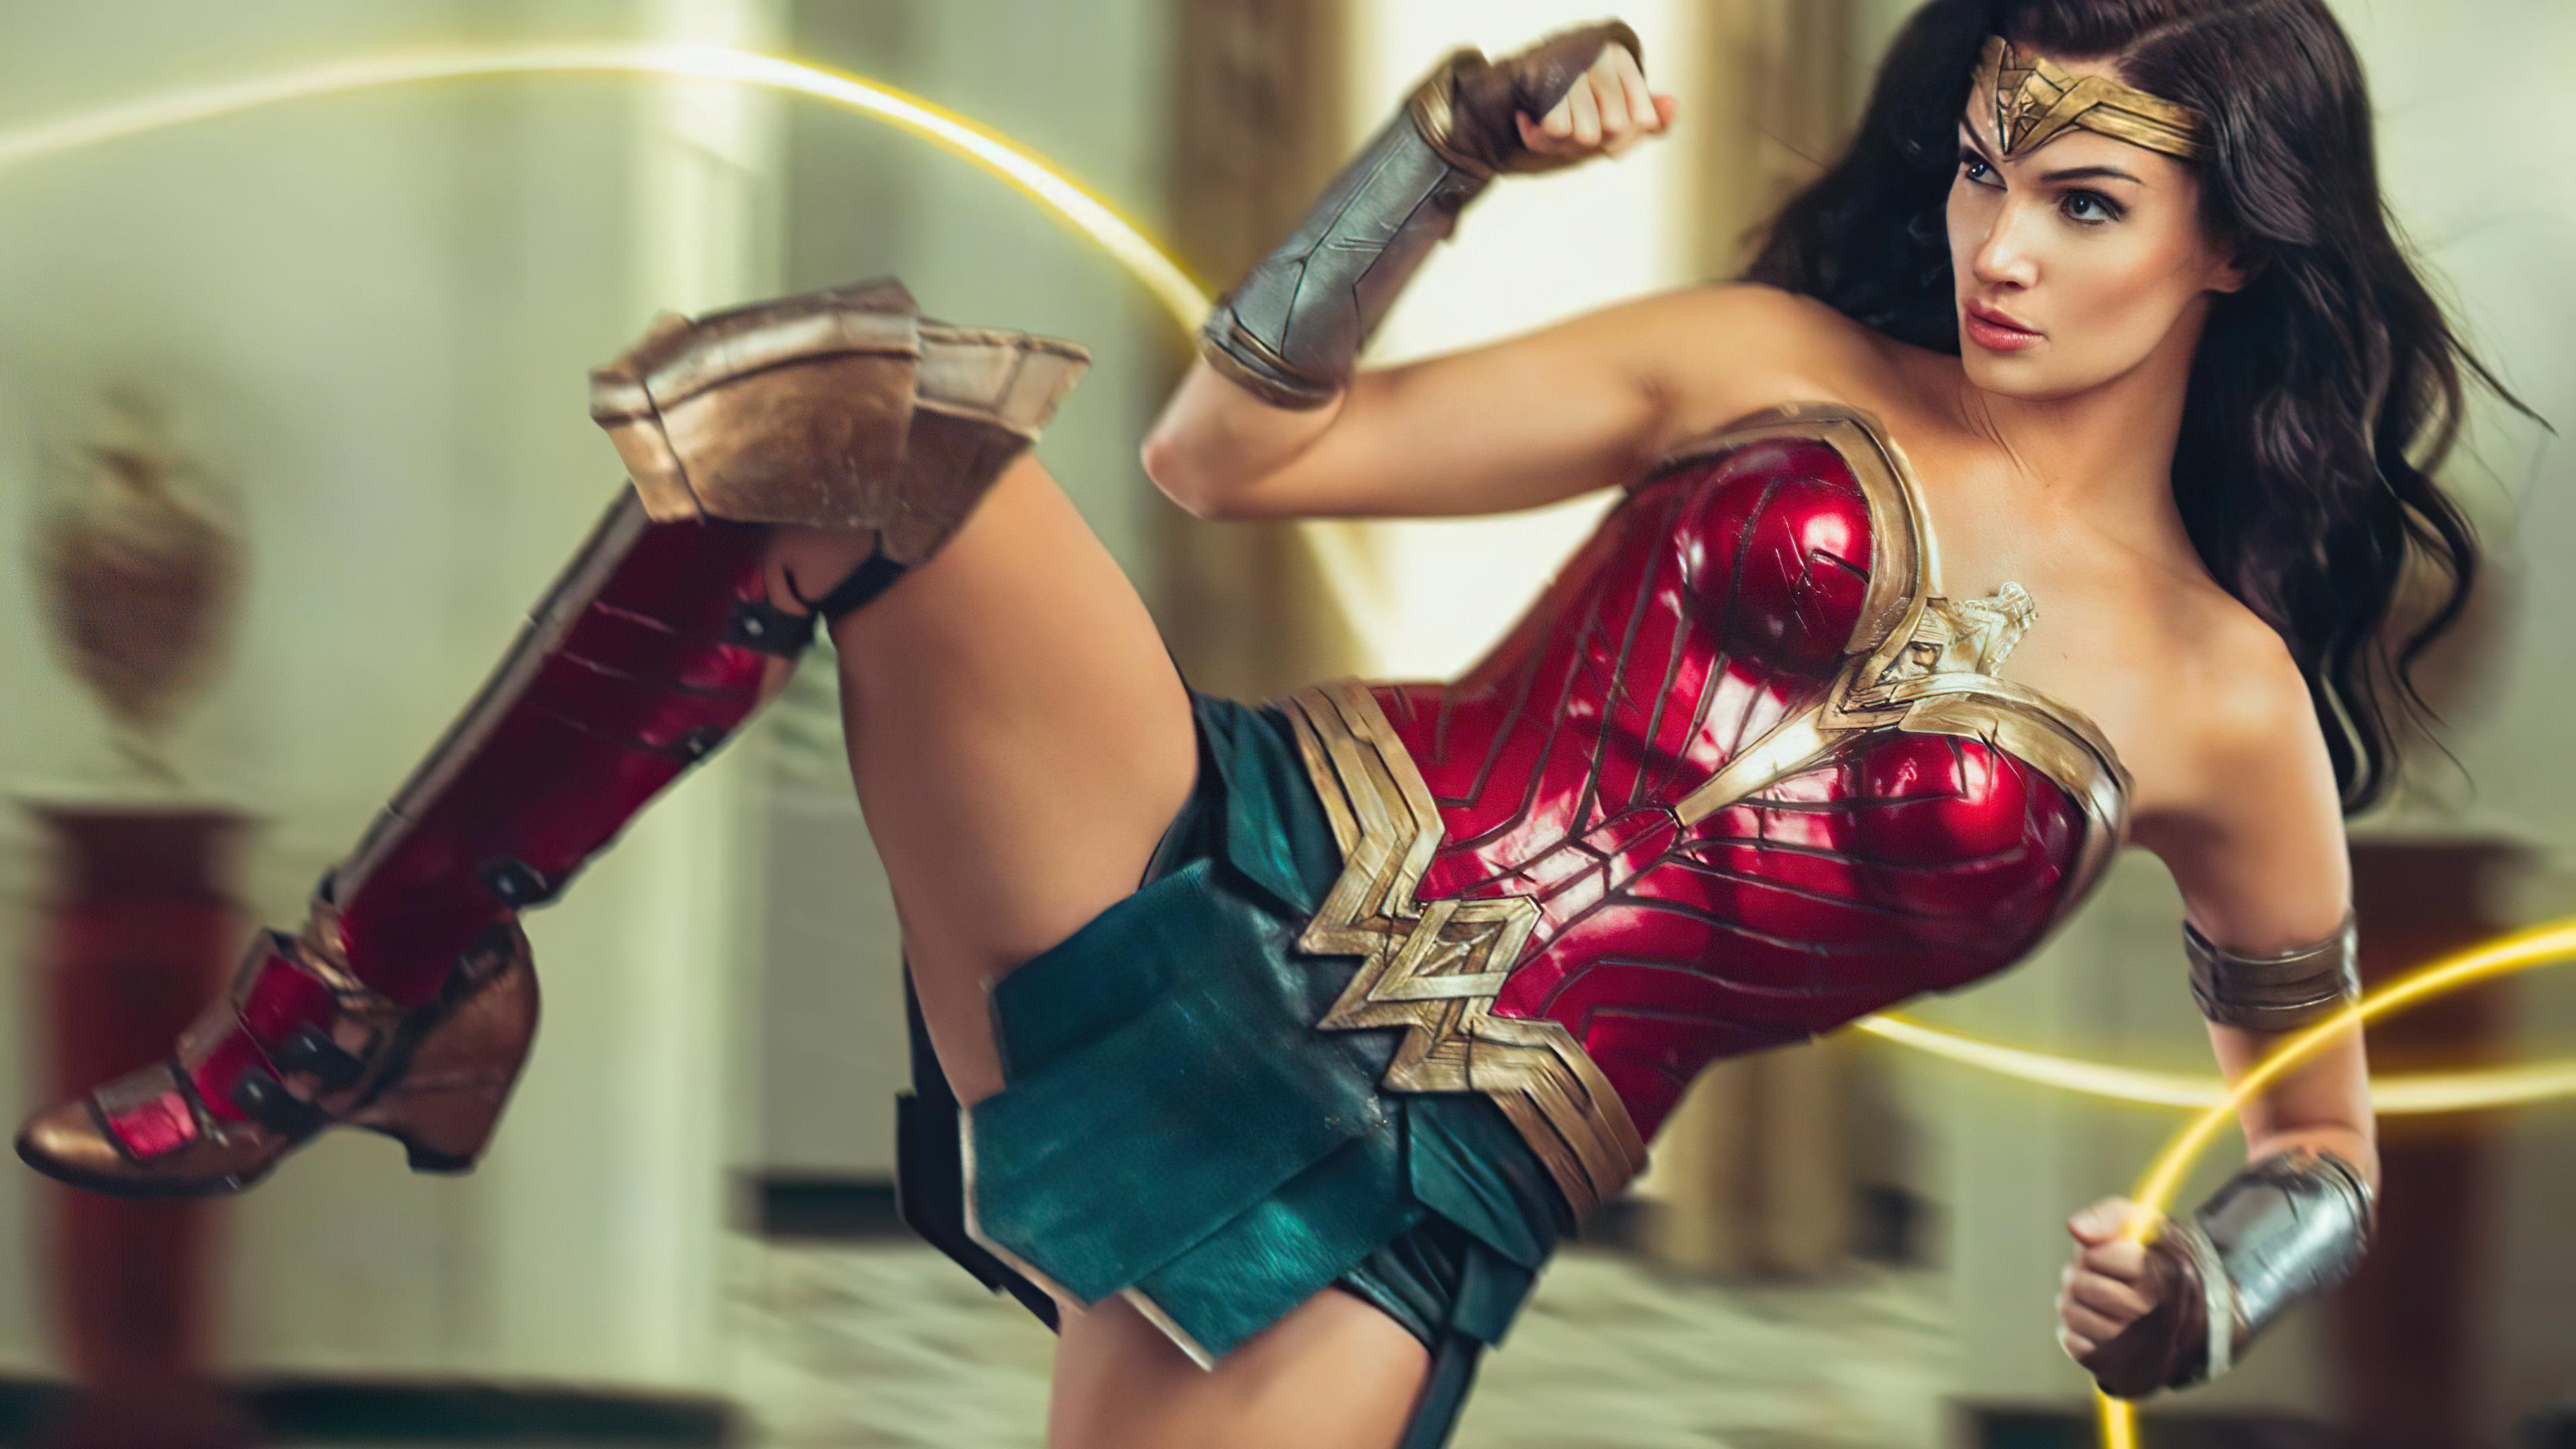 wonder-woman-kick-action-5k-d7.jpg